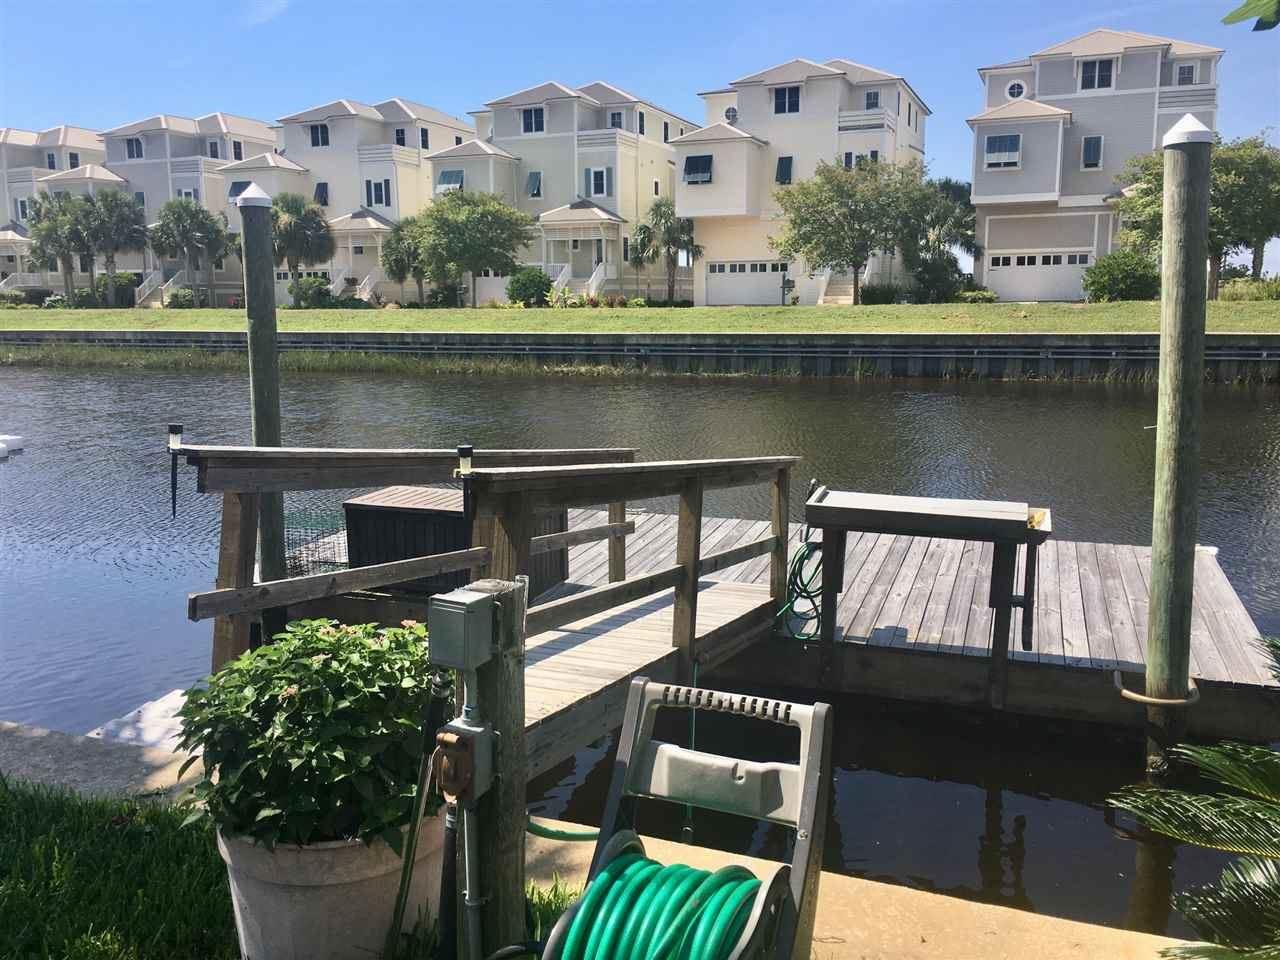 35 Janet Drive, Crawfordville, FL 32327 - MLS#: 320326